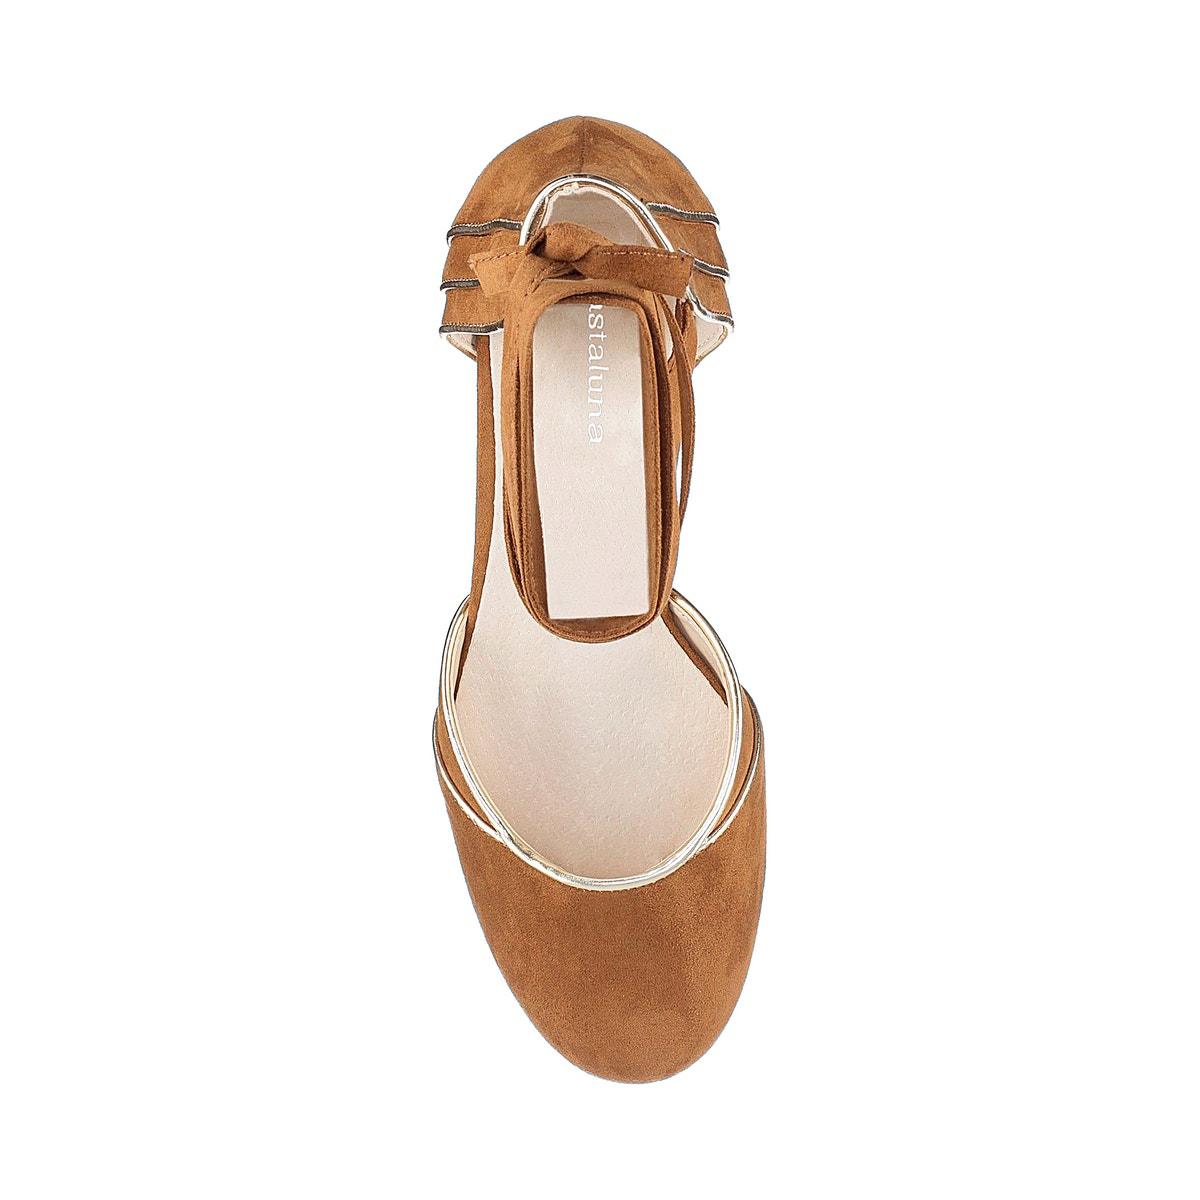 70feee9ca6ce Castaluna Womens Wide Fit Tie Leg Heeled Ballet Pumps